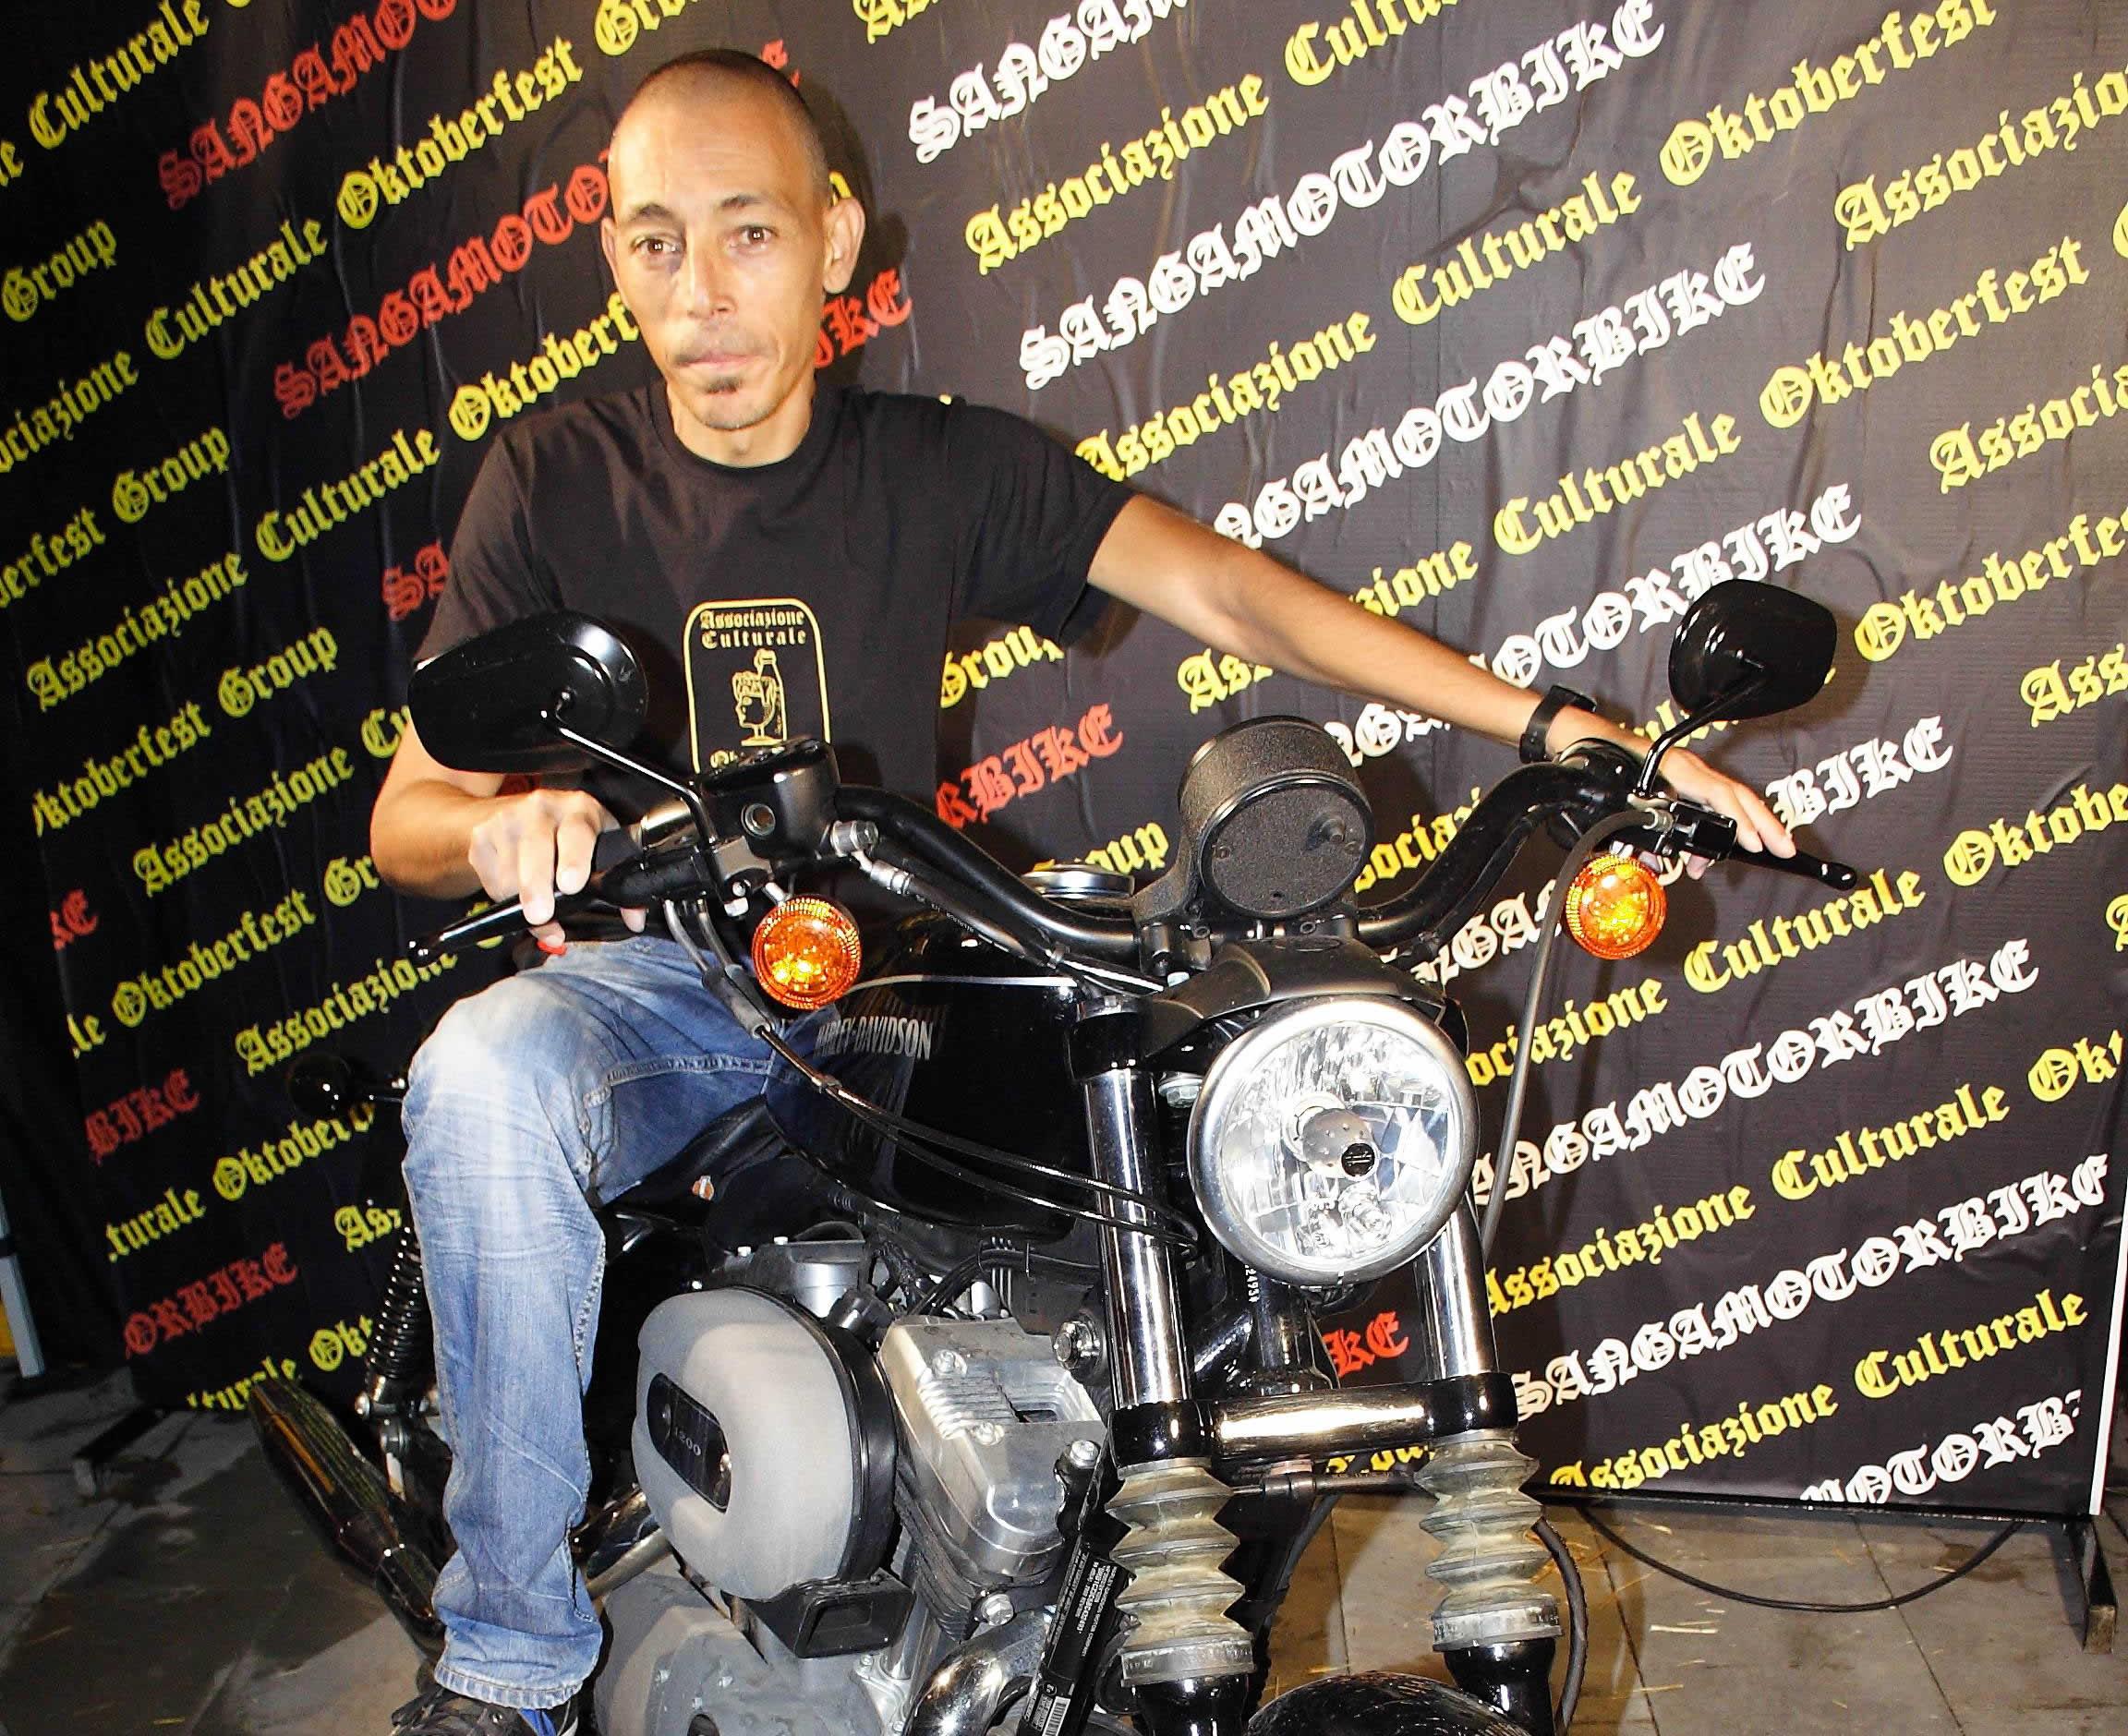 Sangamotorbike 2014